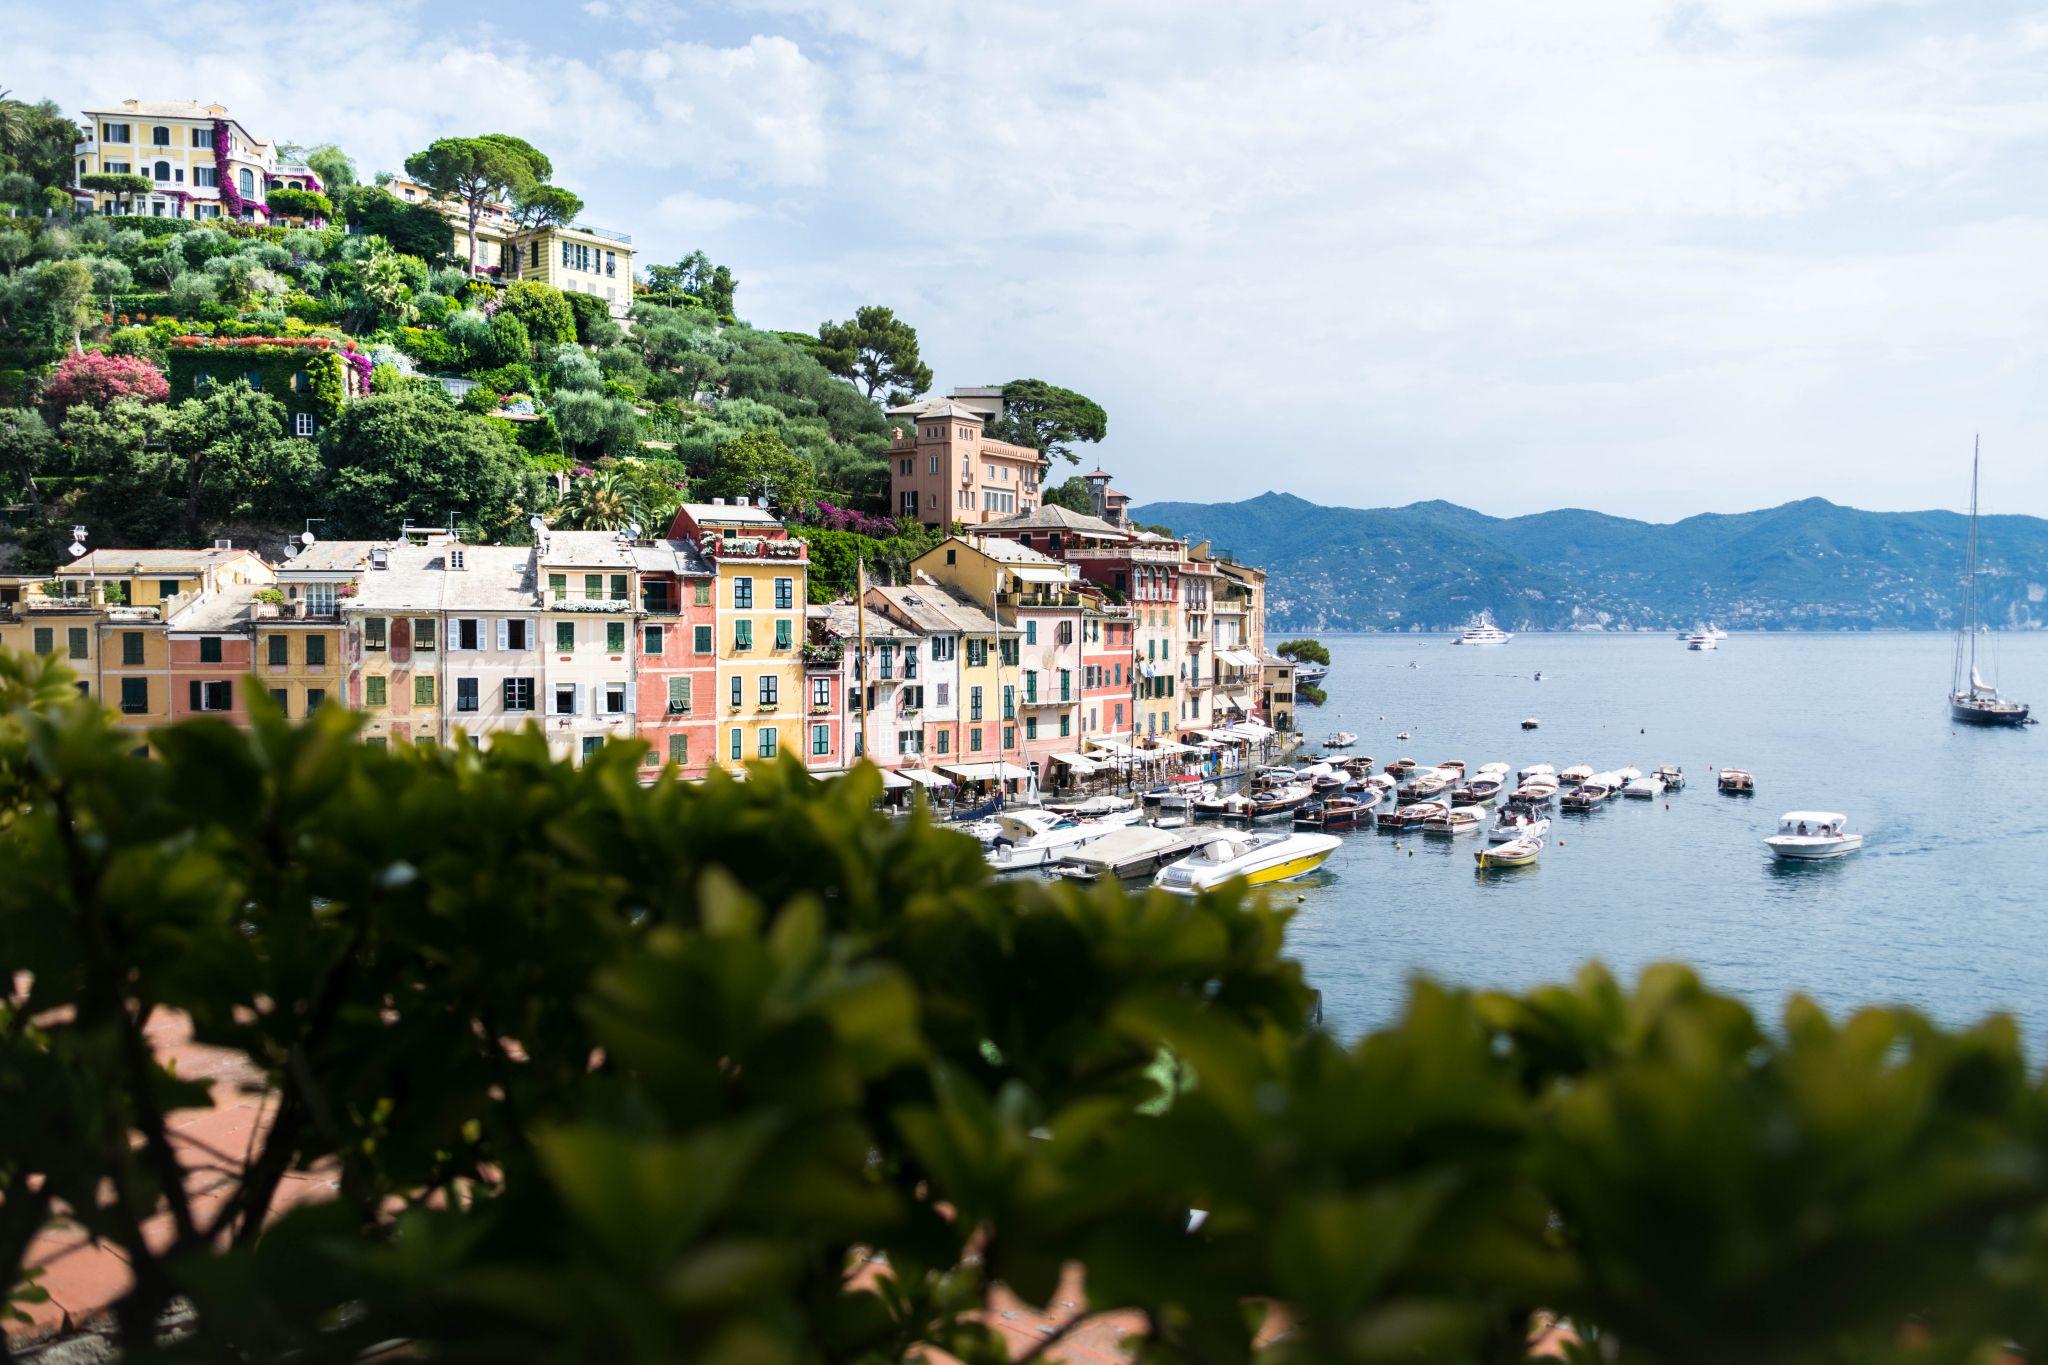 Port of Portofino, Italia, Italy